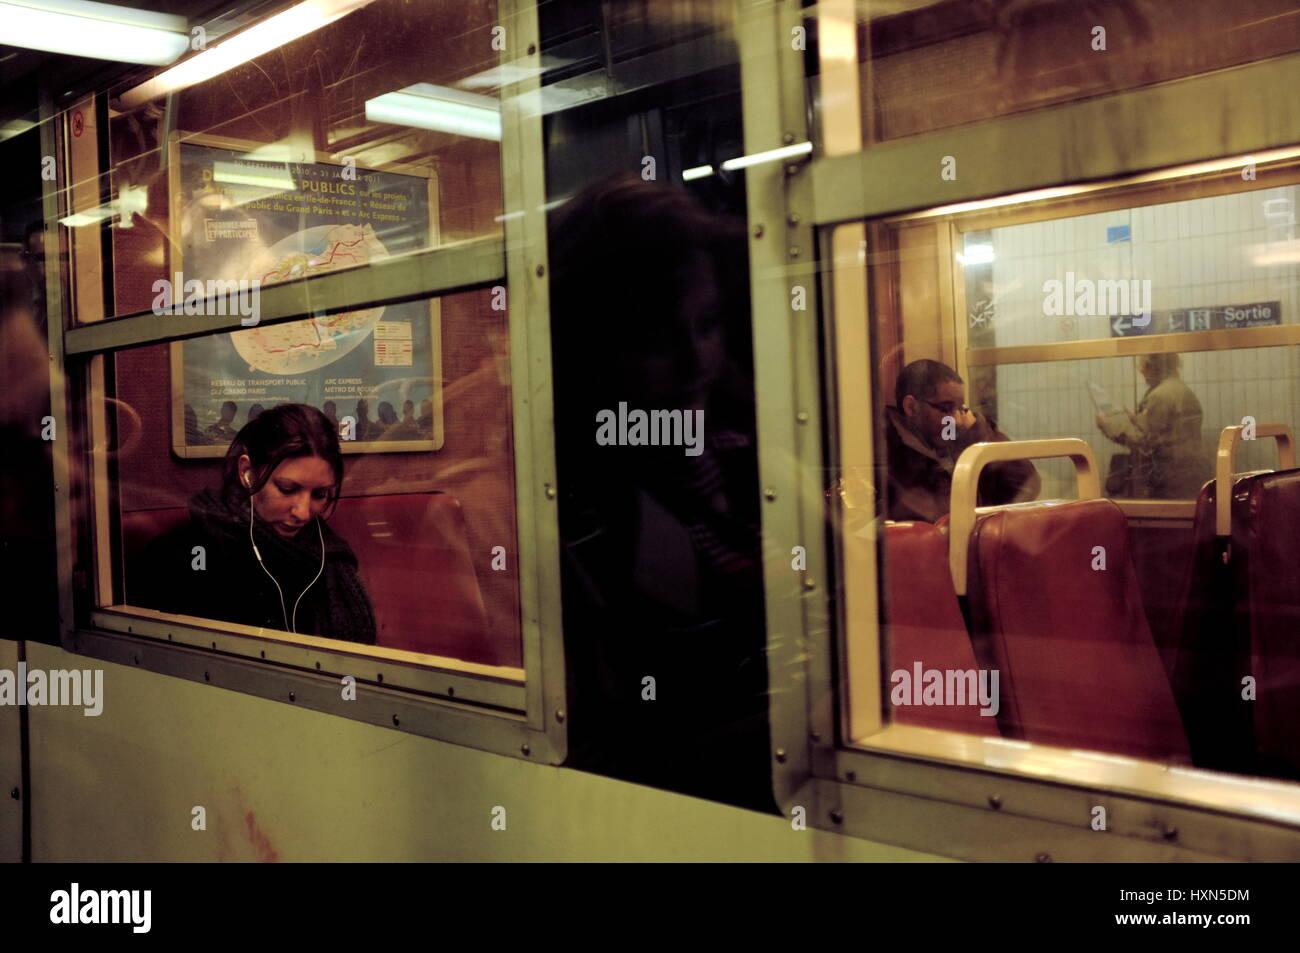 AJAXNETPHOTO. PARIS, FRANCE. - TRAVEL BY TRAIN - PASSENGERS ON A SUBURBAN TRAIN AT NIGHT. PHOTO:JONATHAN EASTLAND/AJAX Stock Photo